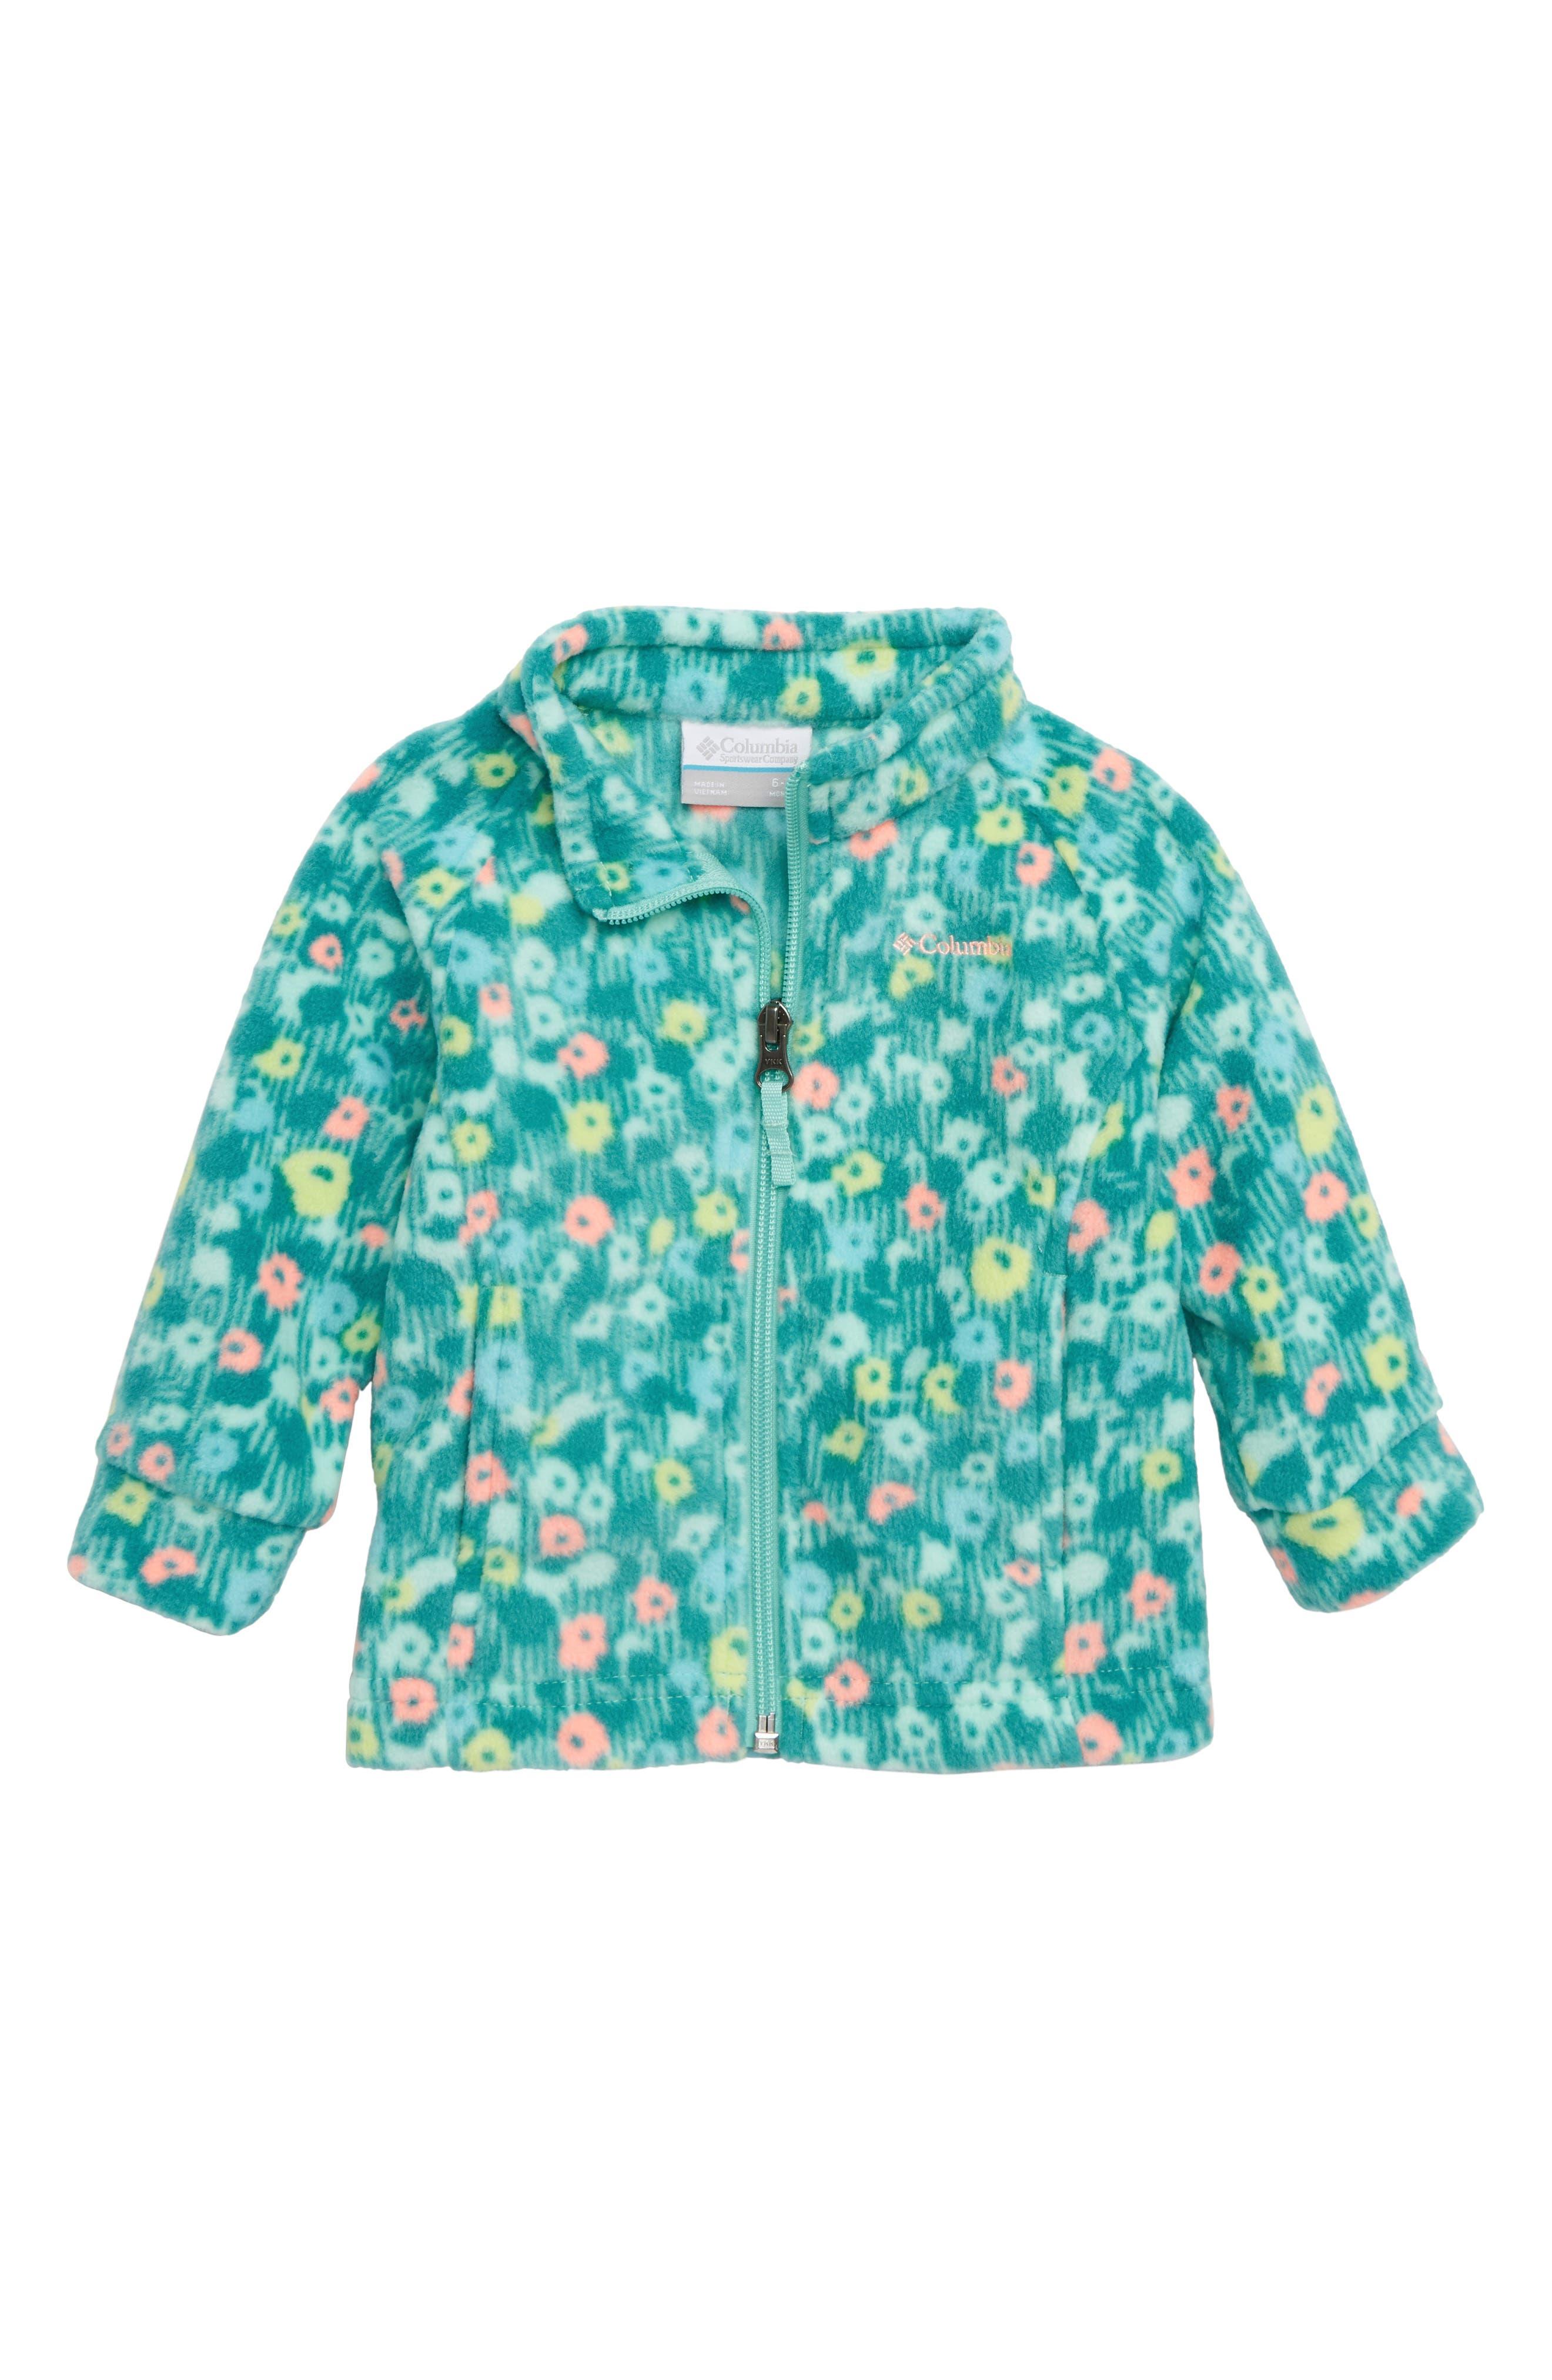 Benton Springs II Fleece Jacket,                             Main thumbnail 1, color,                             PIXIE FLORAL PRINT